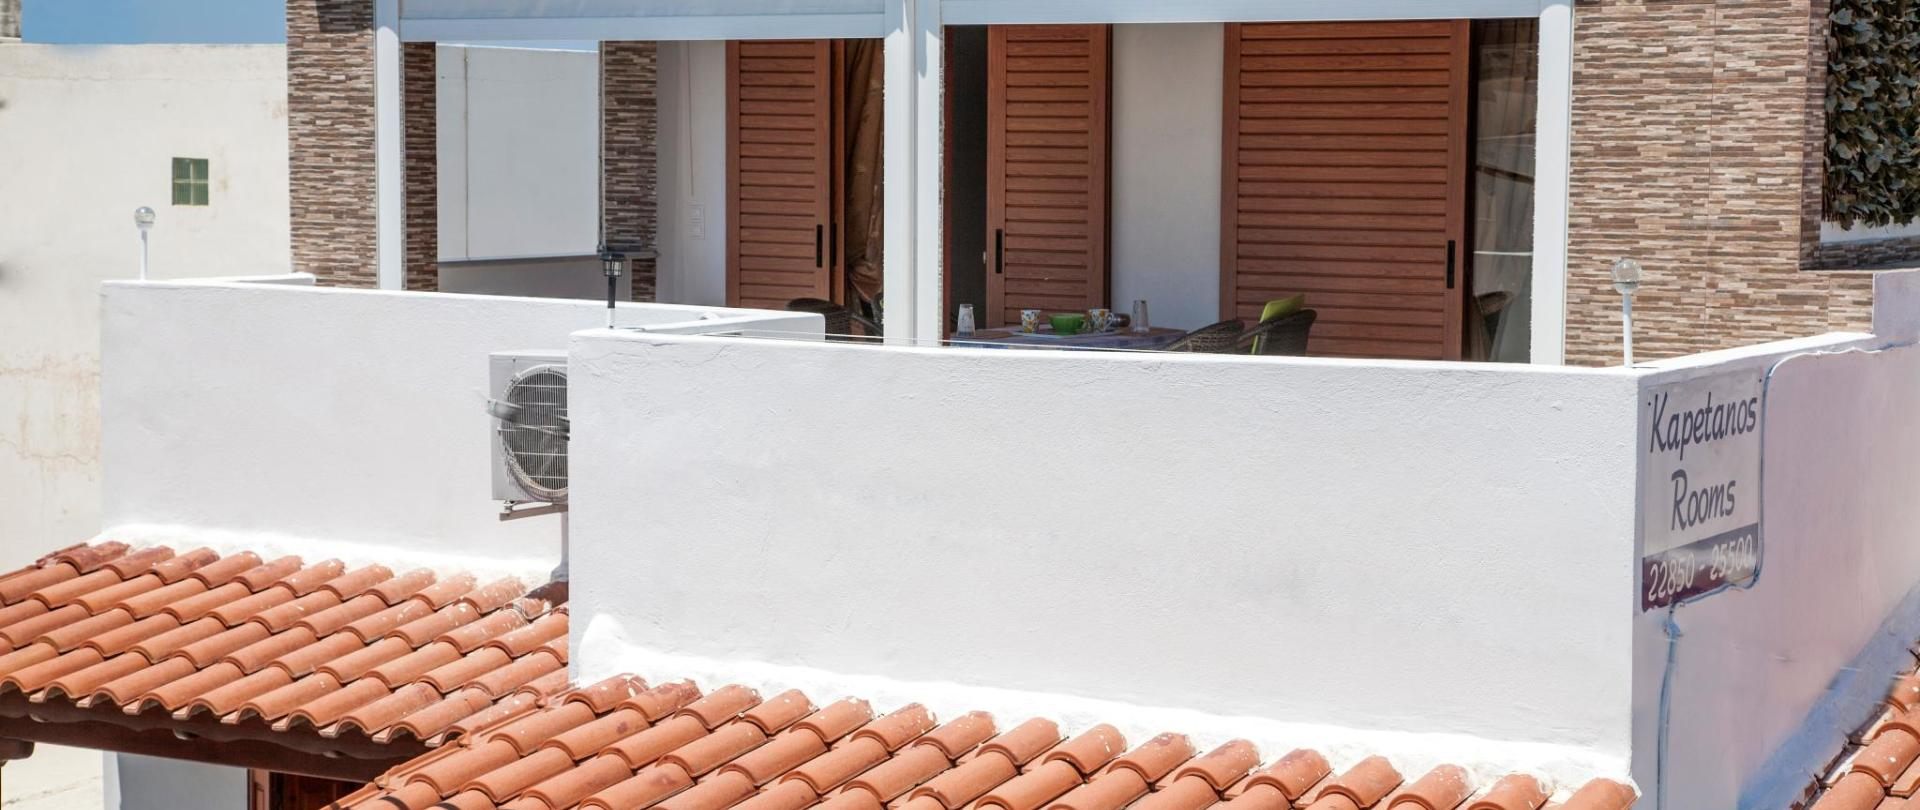 Apartment's balcony.jpg